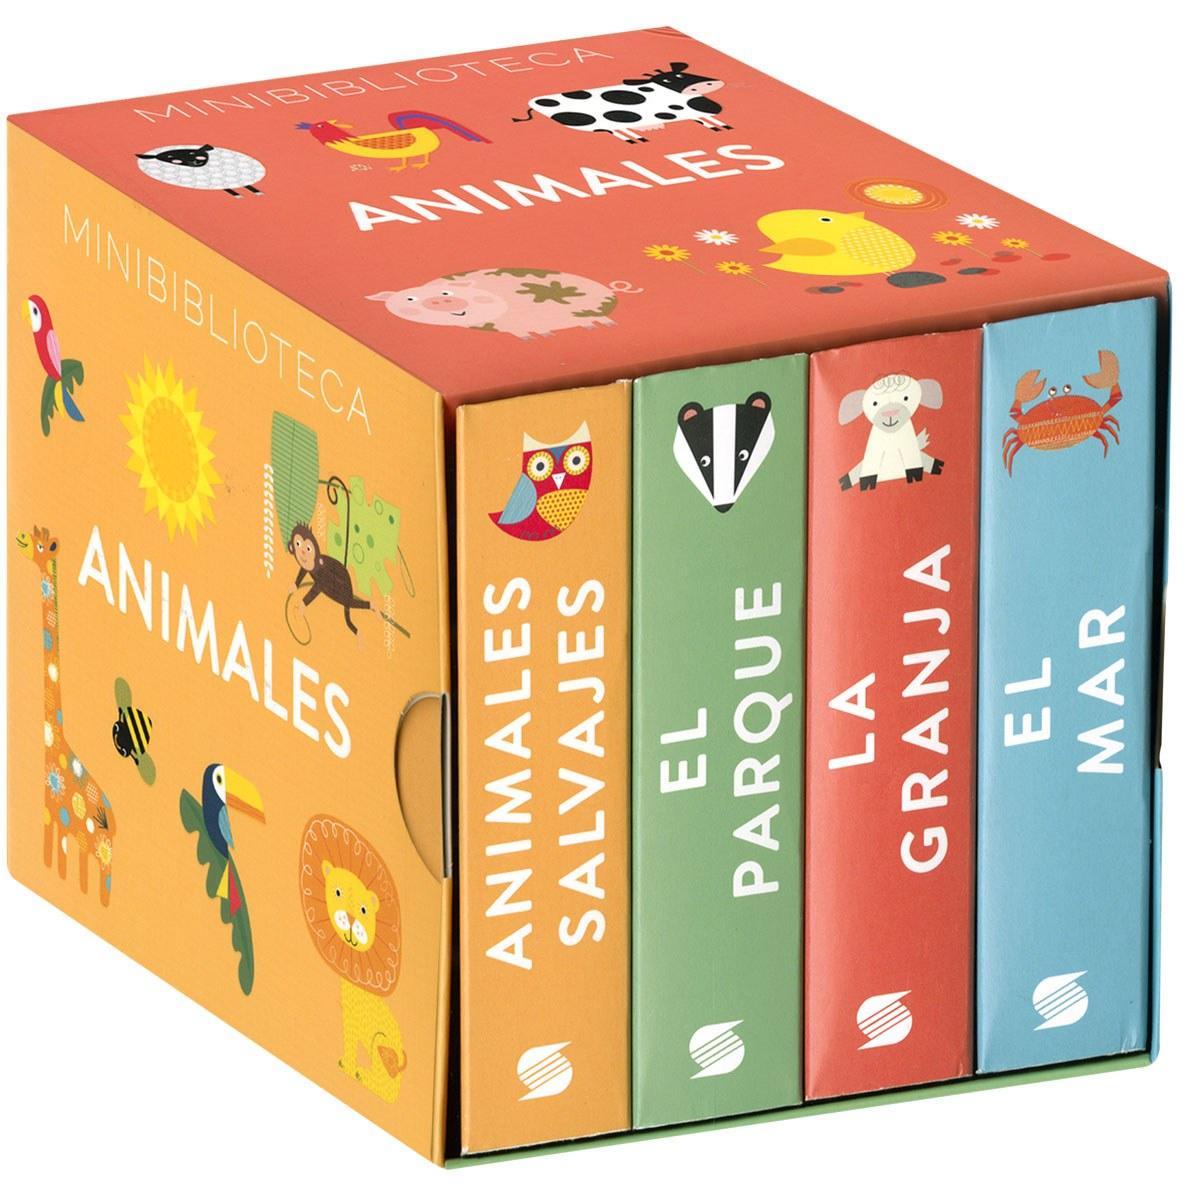 MINIBIBLIOTECA ANIMALES